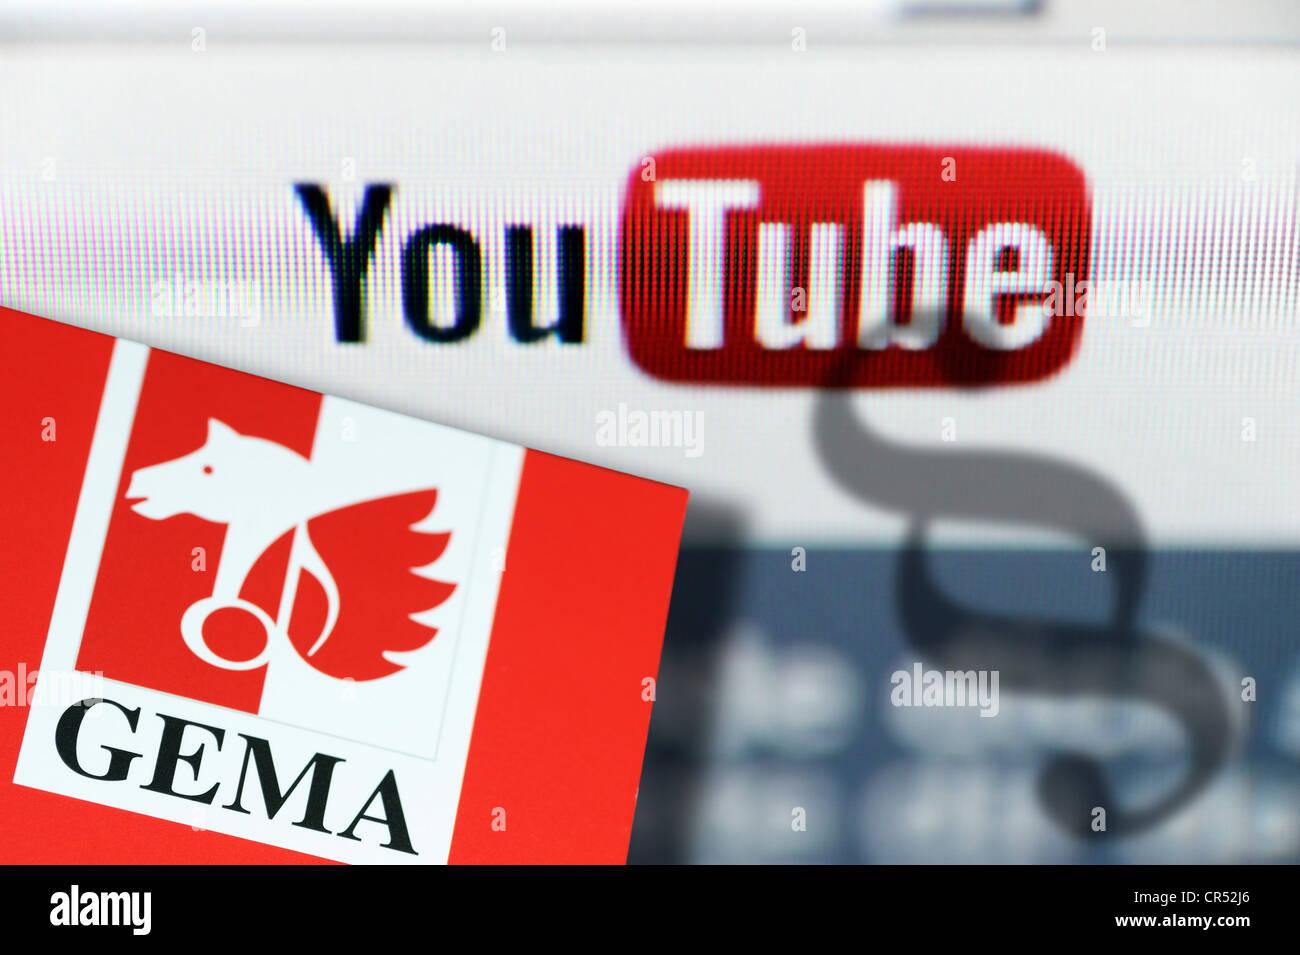 Portal de vídeos YouTube logo y GEMA copyright asociación logotipo, signo jurídico alemán, imagen simbólica Foto de stock